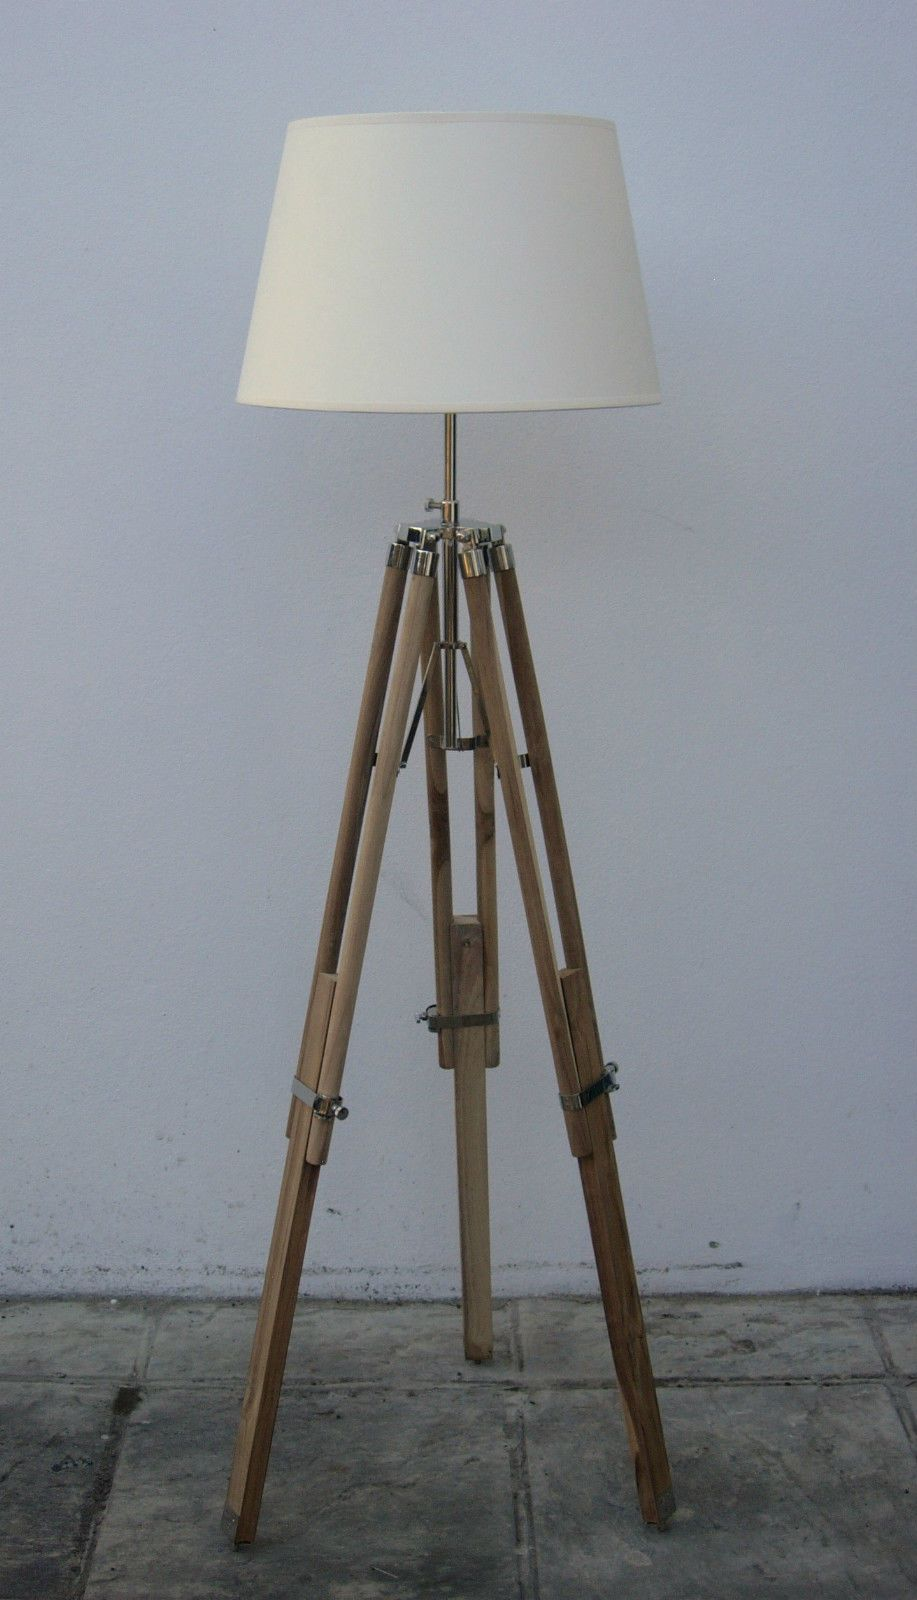 Modern tripod light standard floor lamp without shade ebay modern tripod light standard floor lamp without shade ebay mozeypictures Choice Image